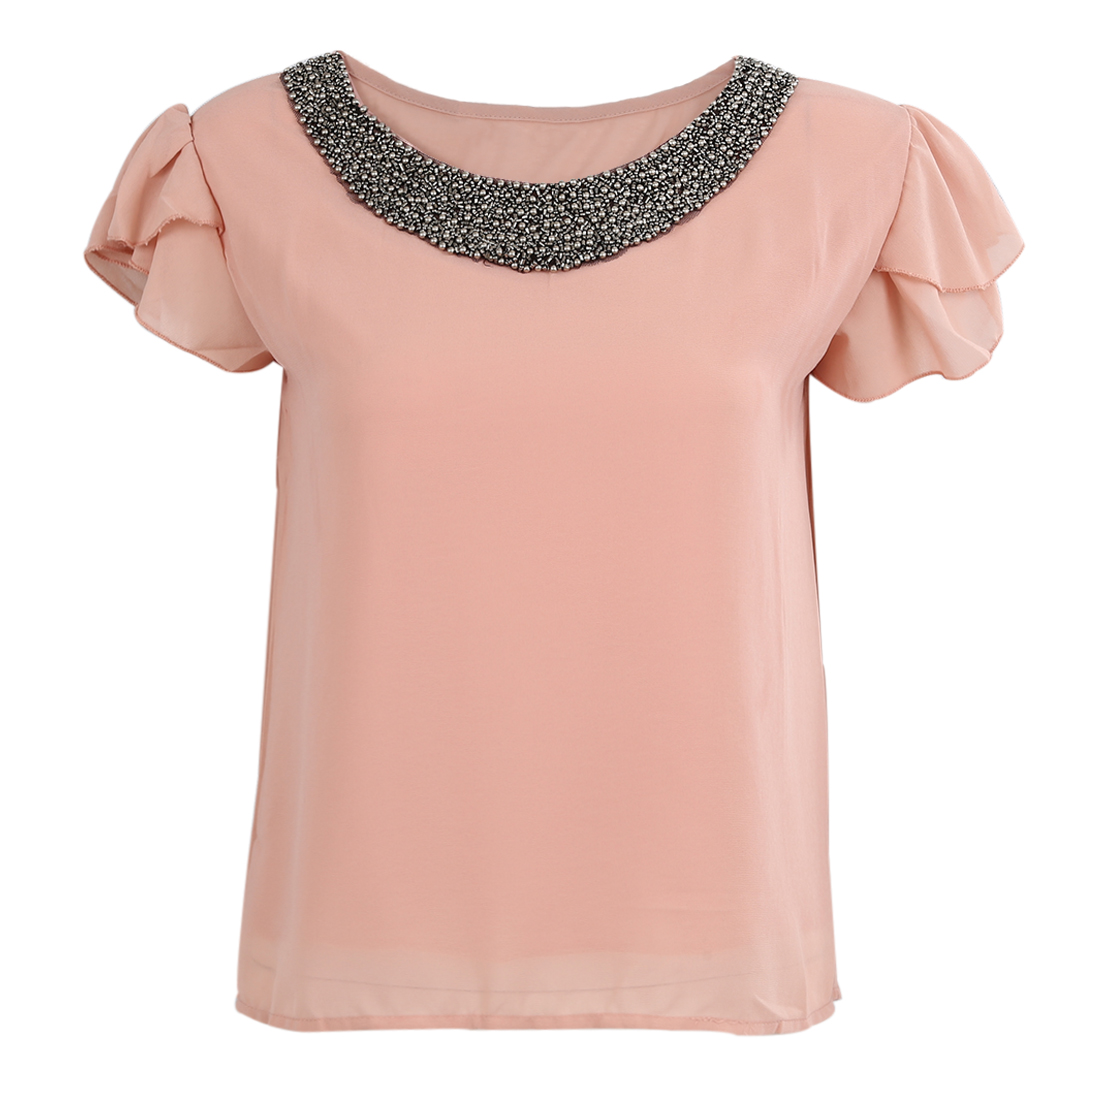 fashion women chiffon casual vintage Beading O-neck Pullover <font><b>shirts</b></font> <font><b>Nude</b></font> <font><b>pink</b></font>